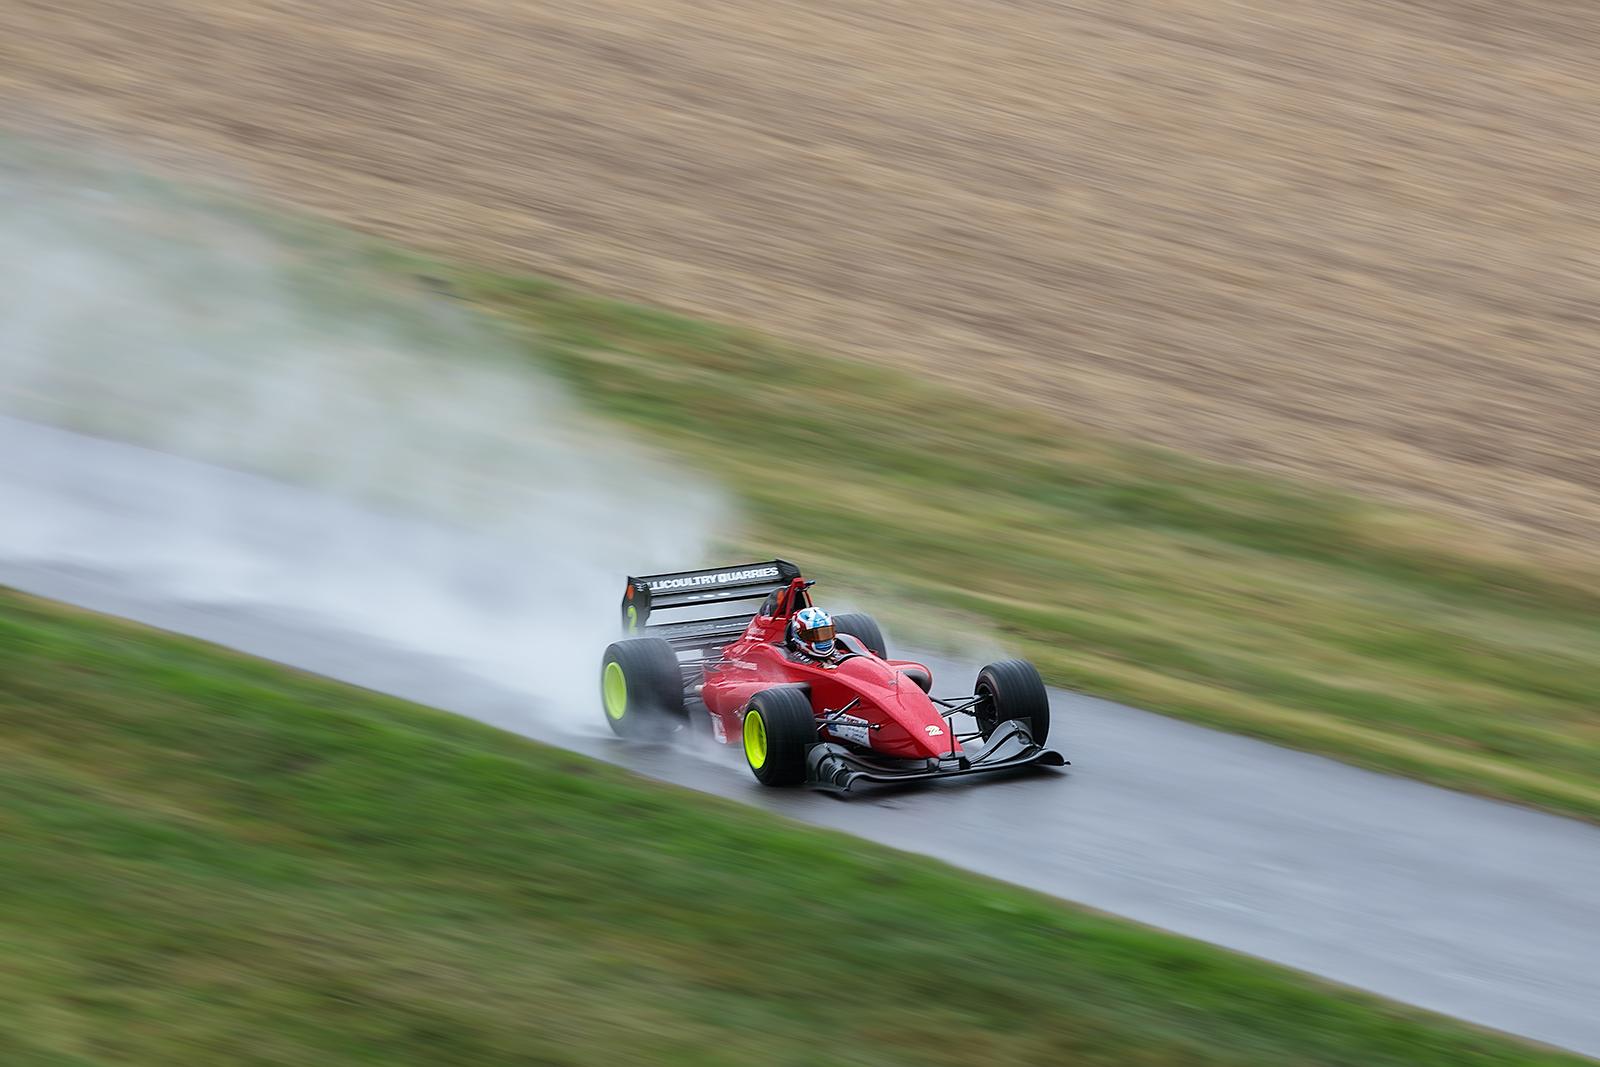 Second 'Racing Through the Rain' by Shaun Duke